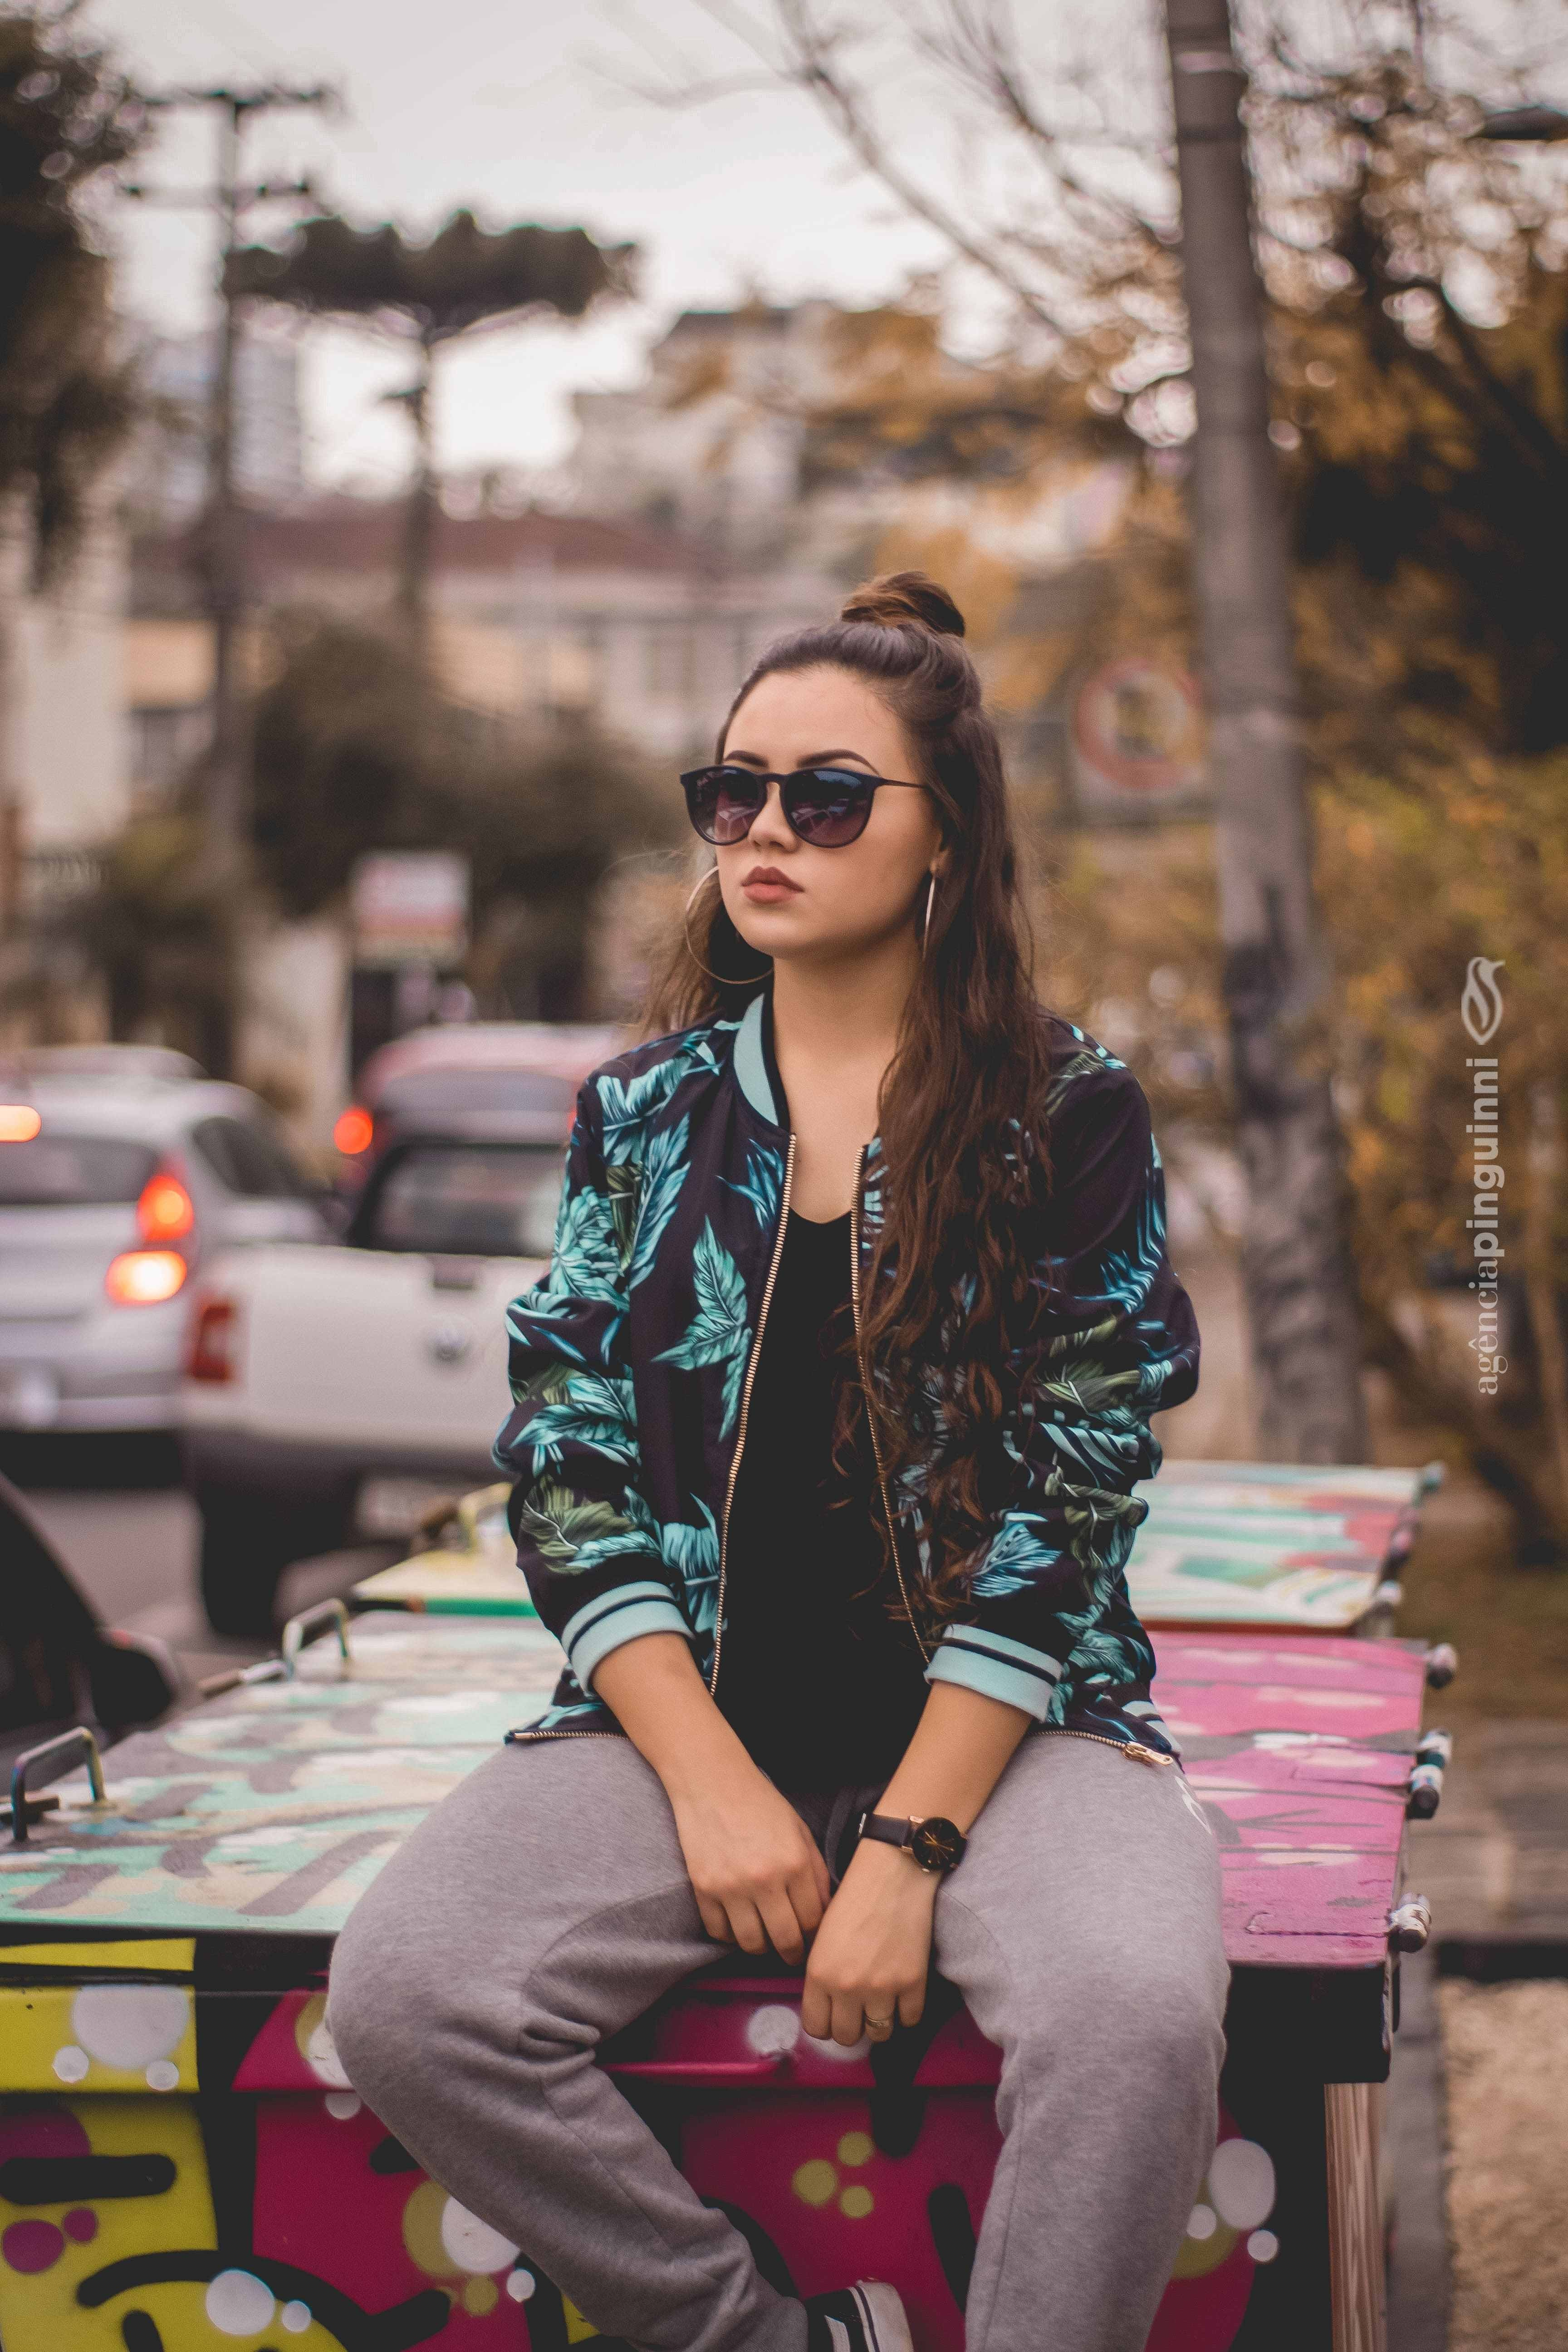 Go to Rafaella Prado's profile